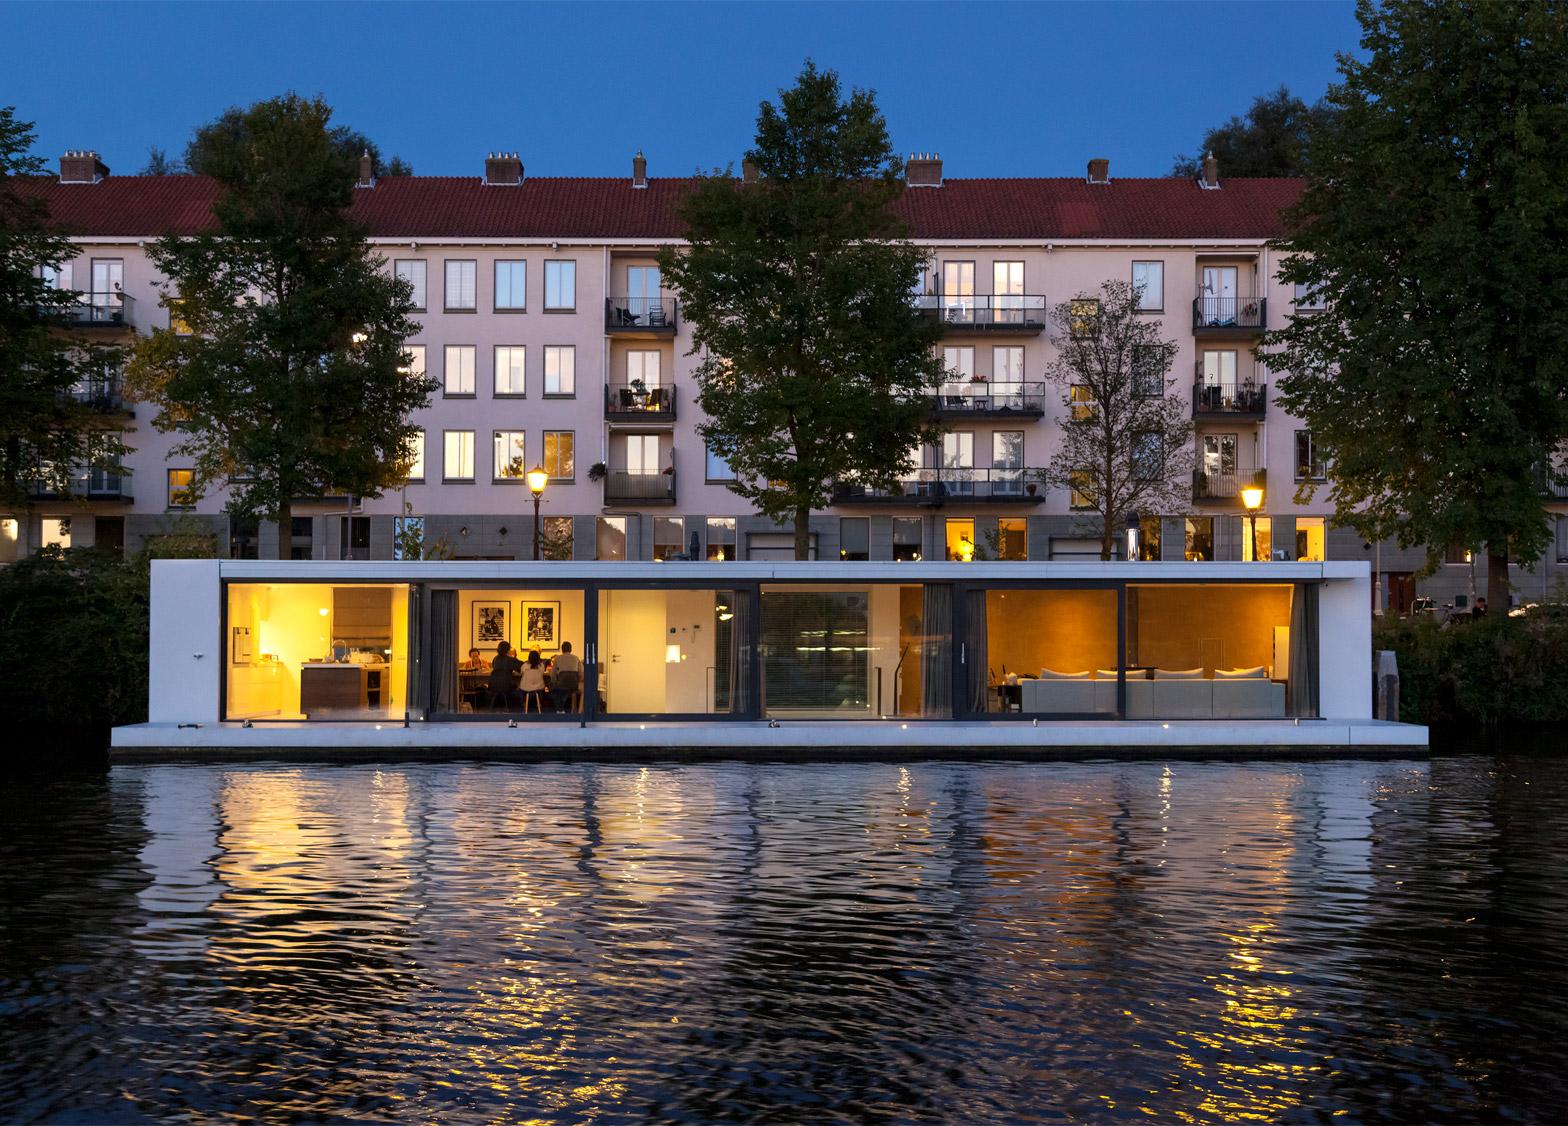 +31 Architects's Watervilla Weesperzijde houseboat in Amsterdam